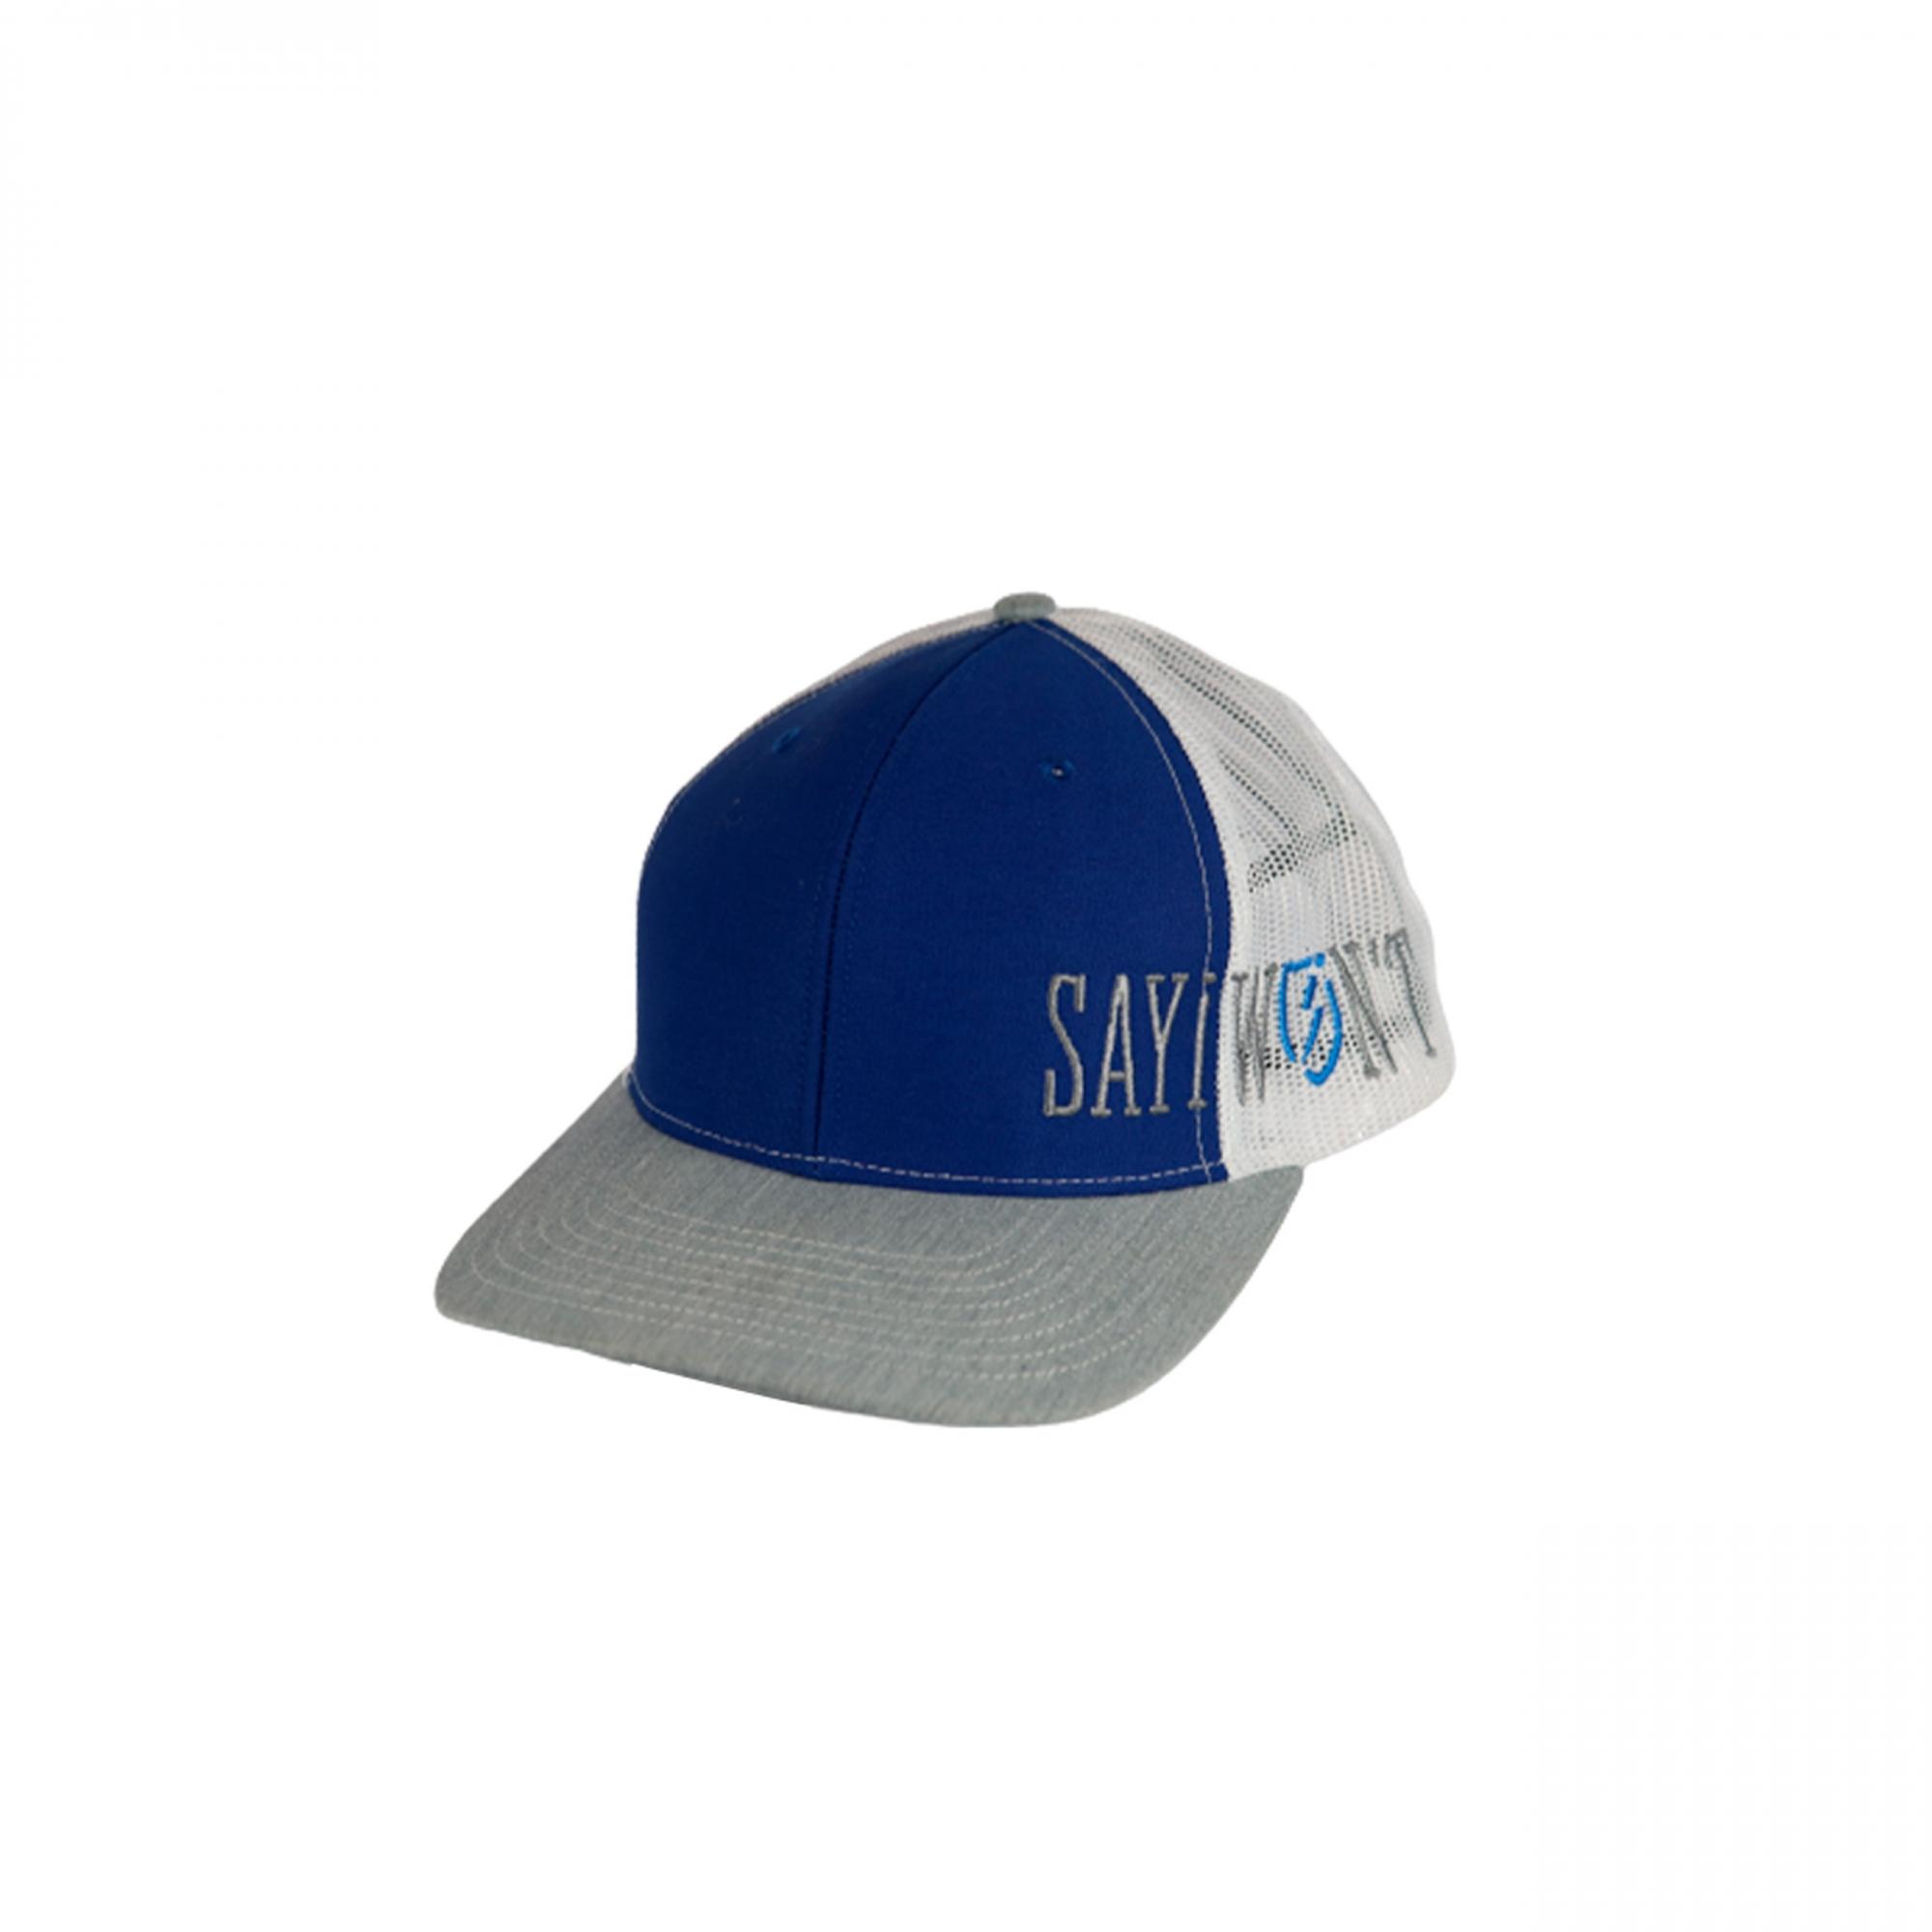 Boné Importado Sayiwont Azul/Cinza Sayiwont001